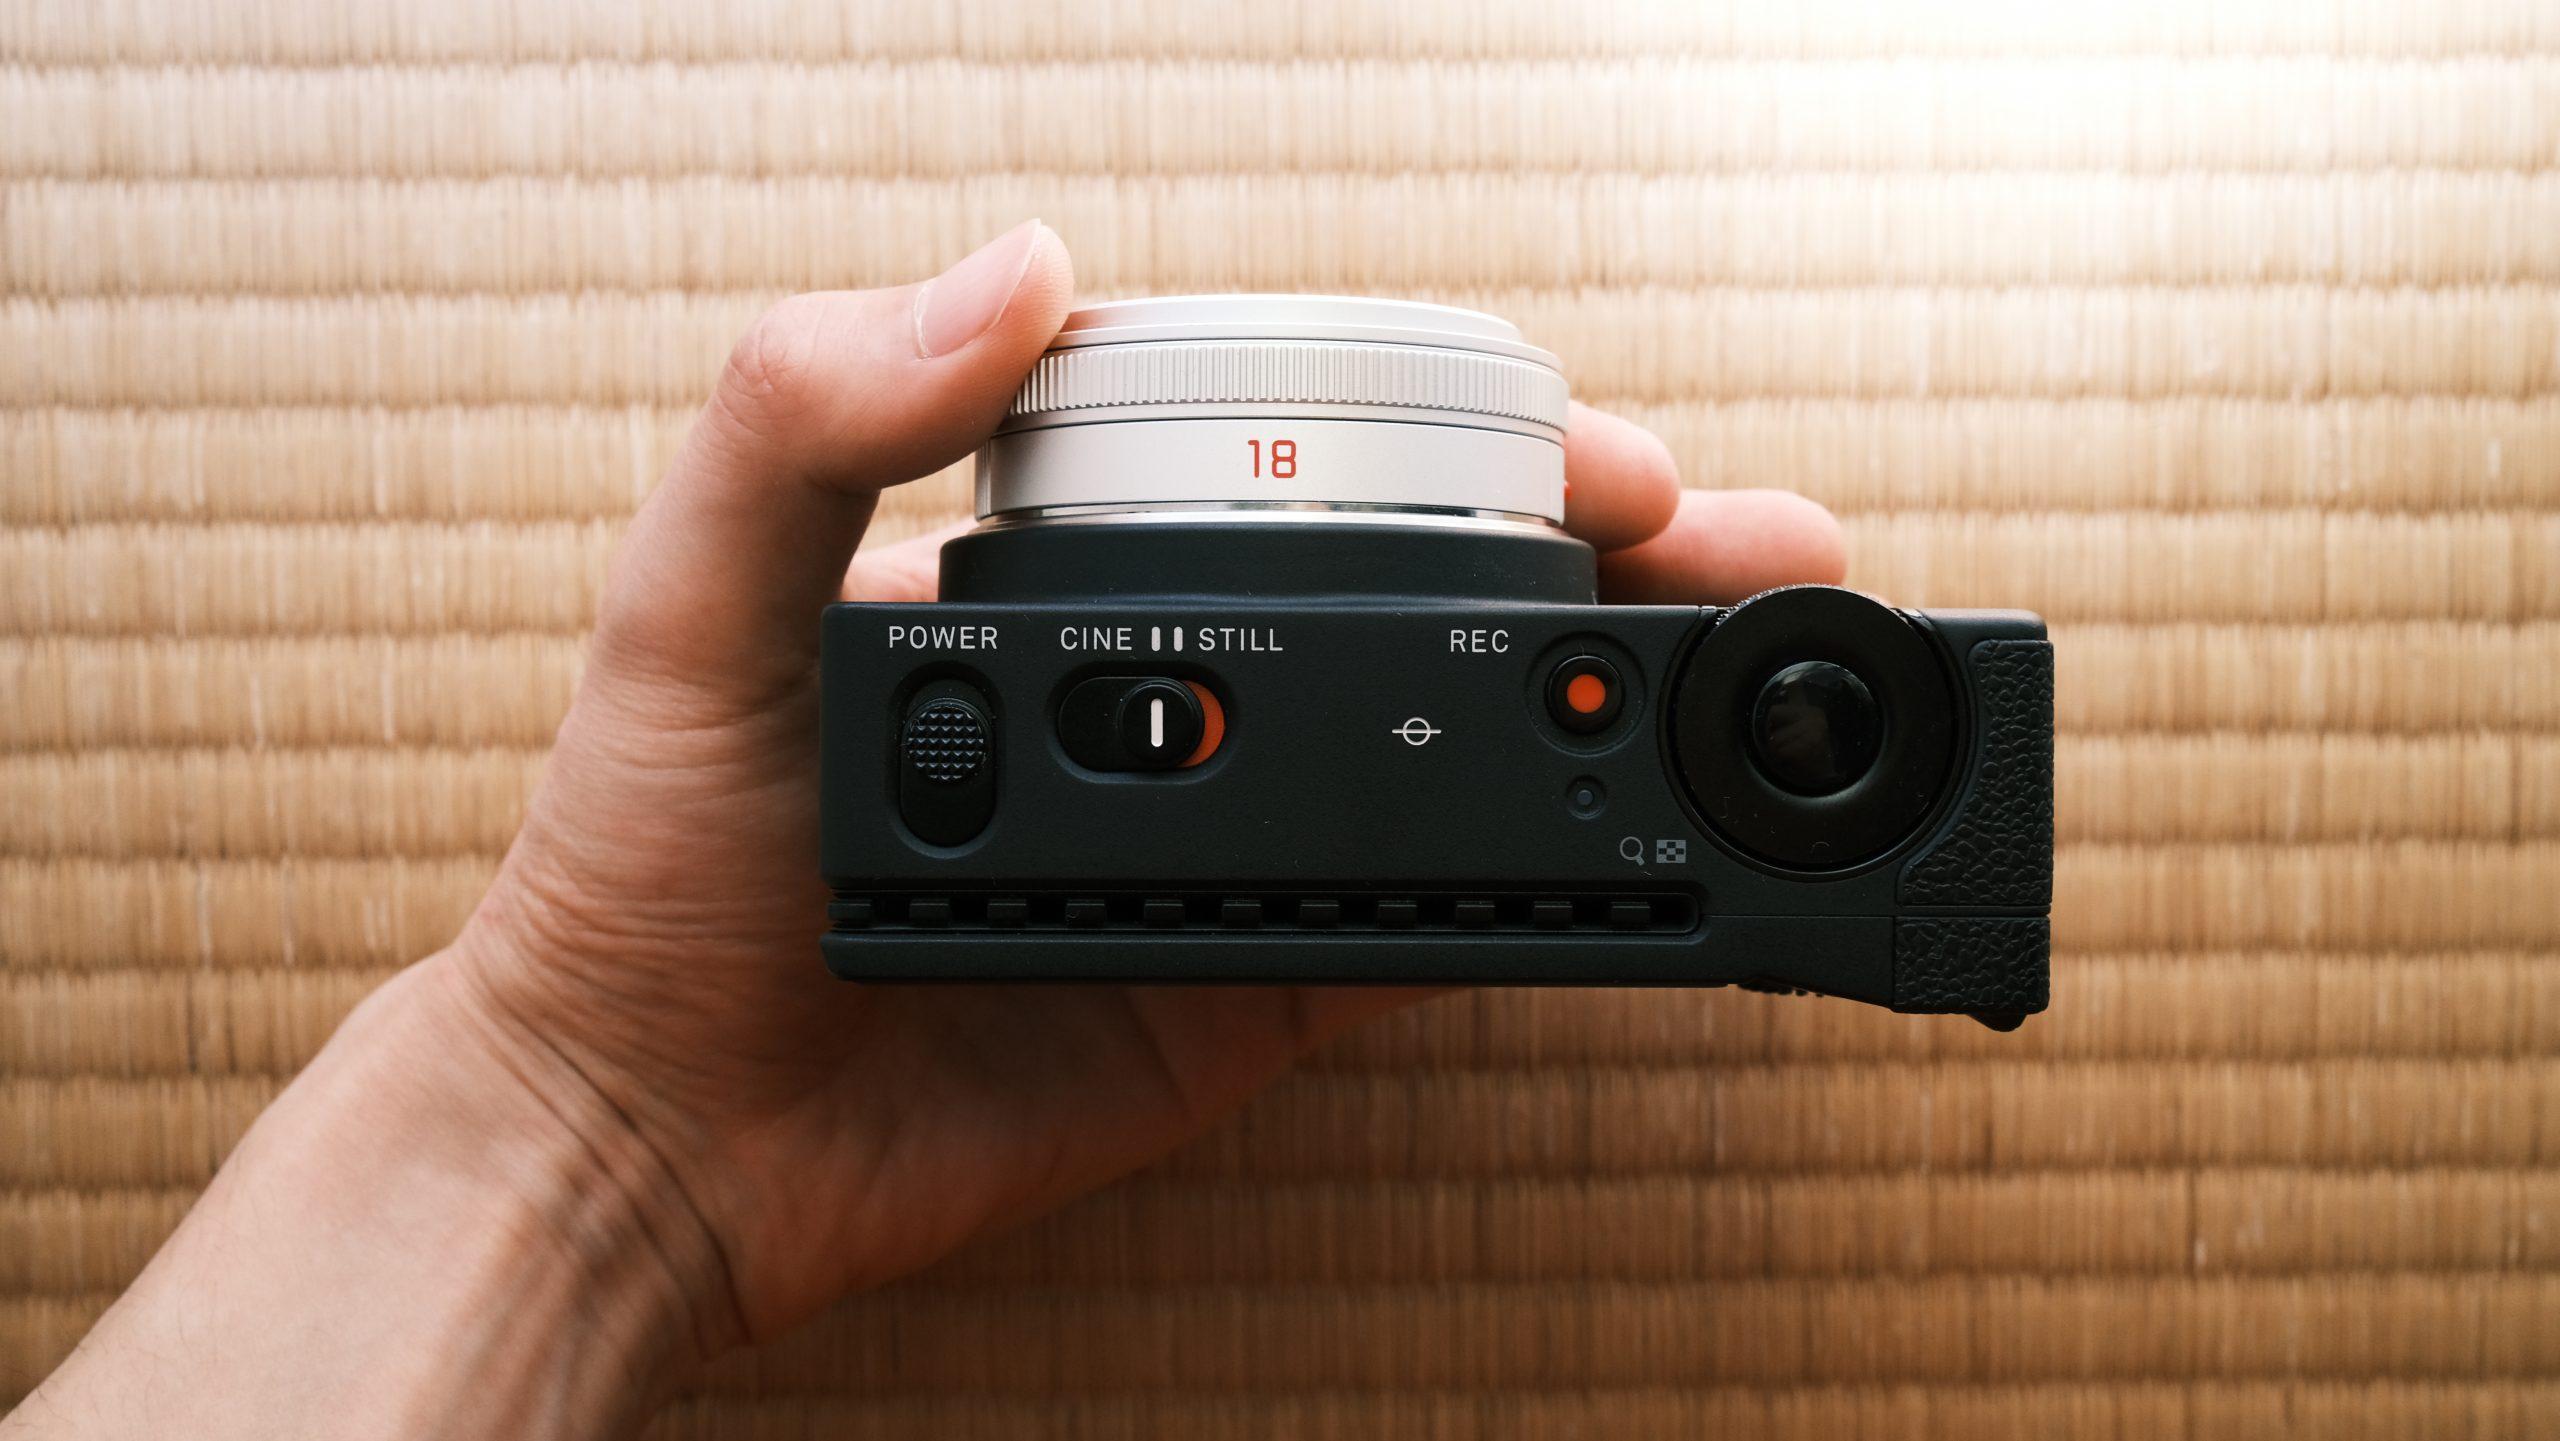 【SIGMA】fpとエルマリート TL 18mm F2.8 ASPH.で手軽に動画を録る。